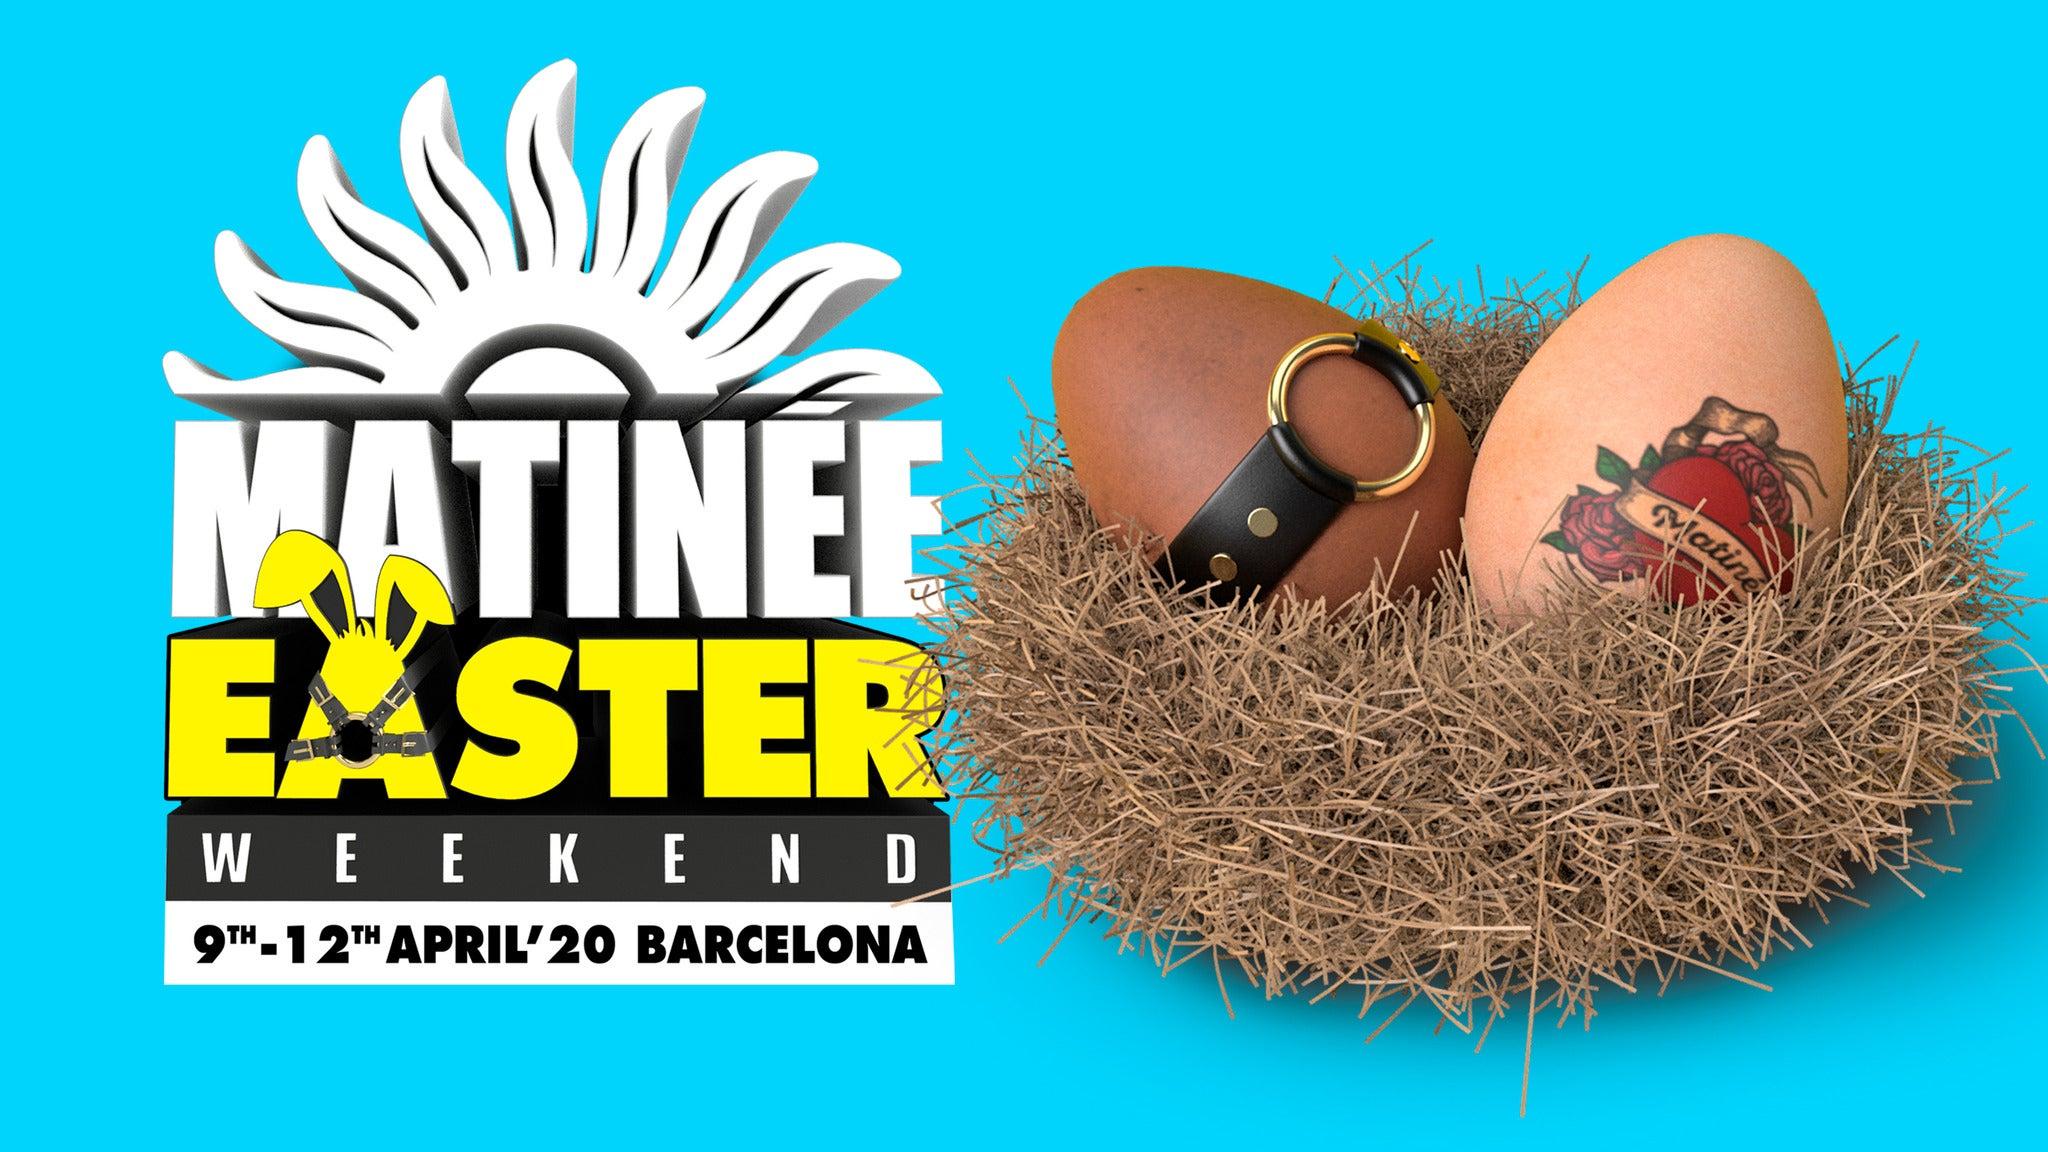 Matinée Easter Weekend - Abono